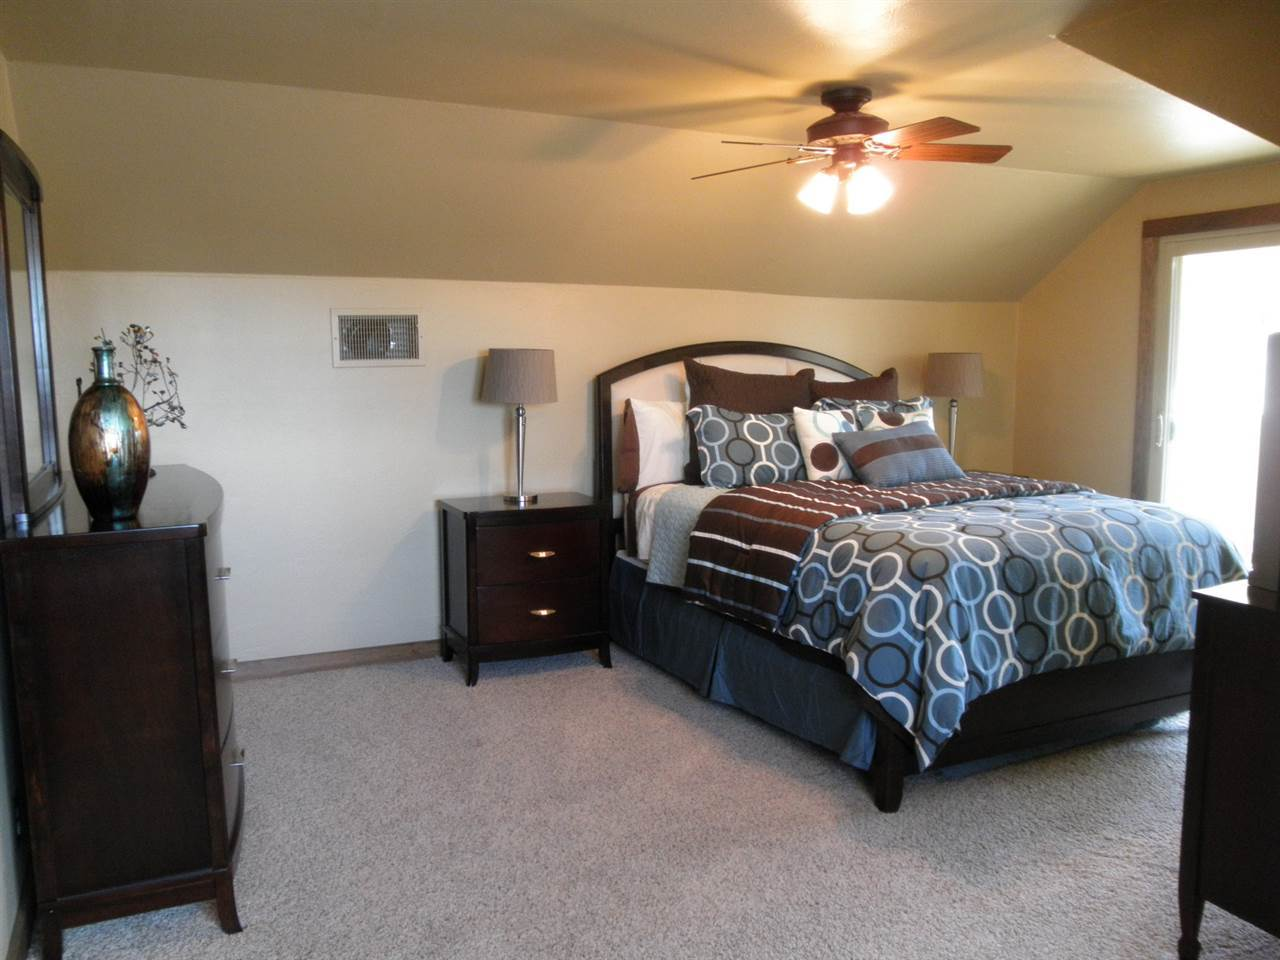 Sold Intraoffice W/MLS | 7038 River Ridge Drive  Ponca City, OK 74604 18